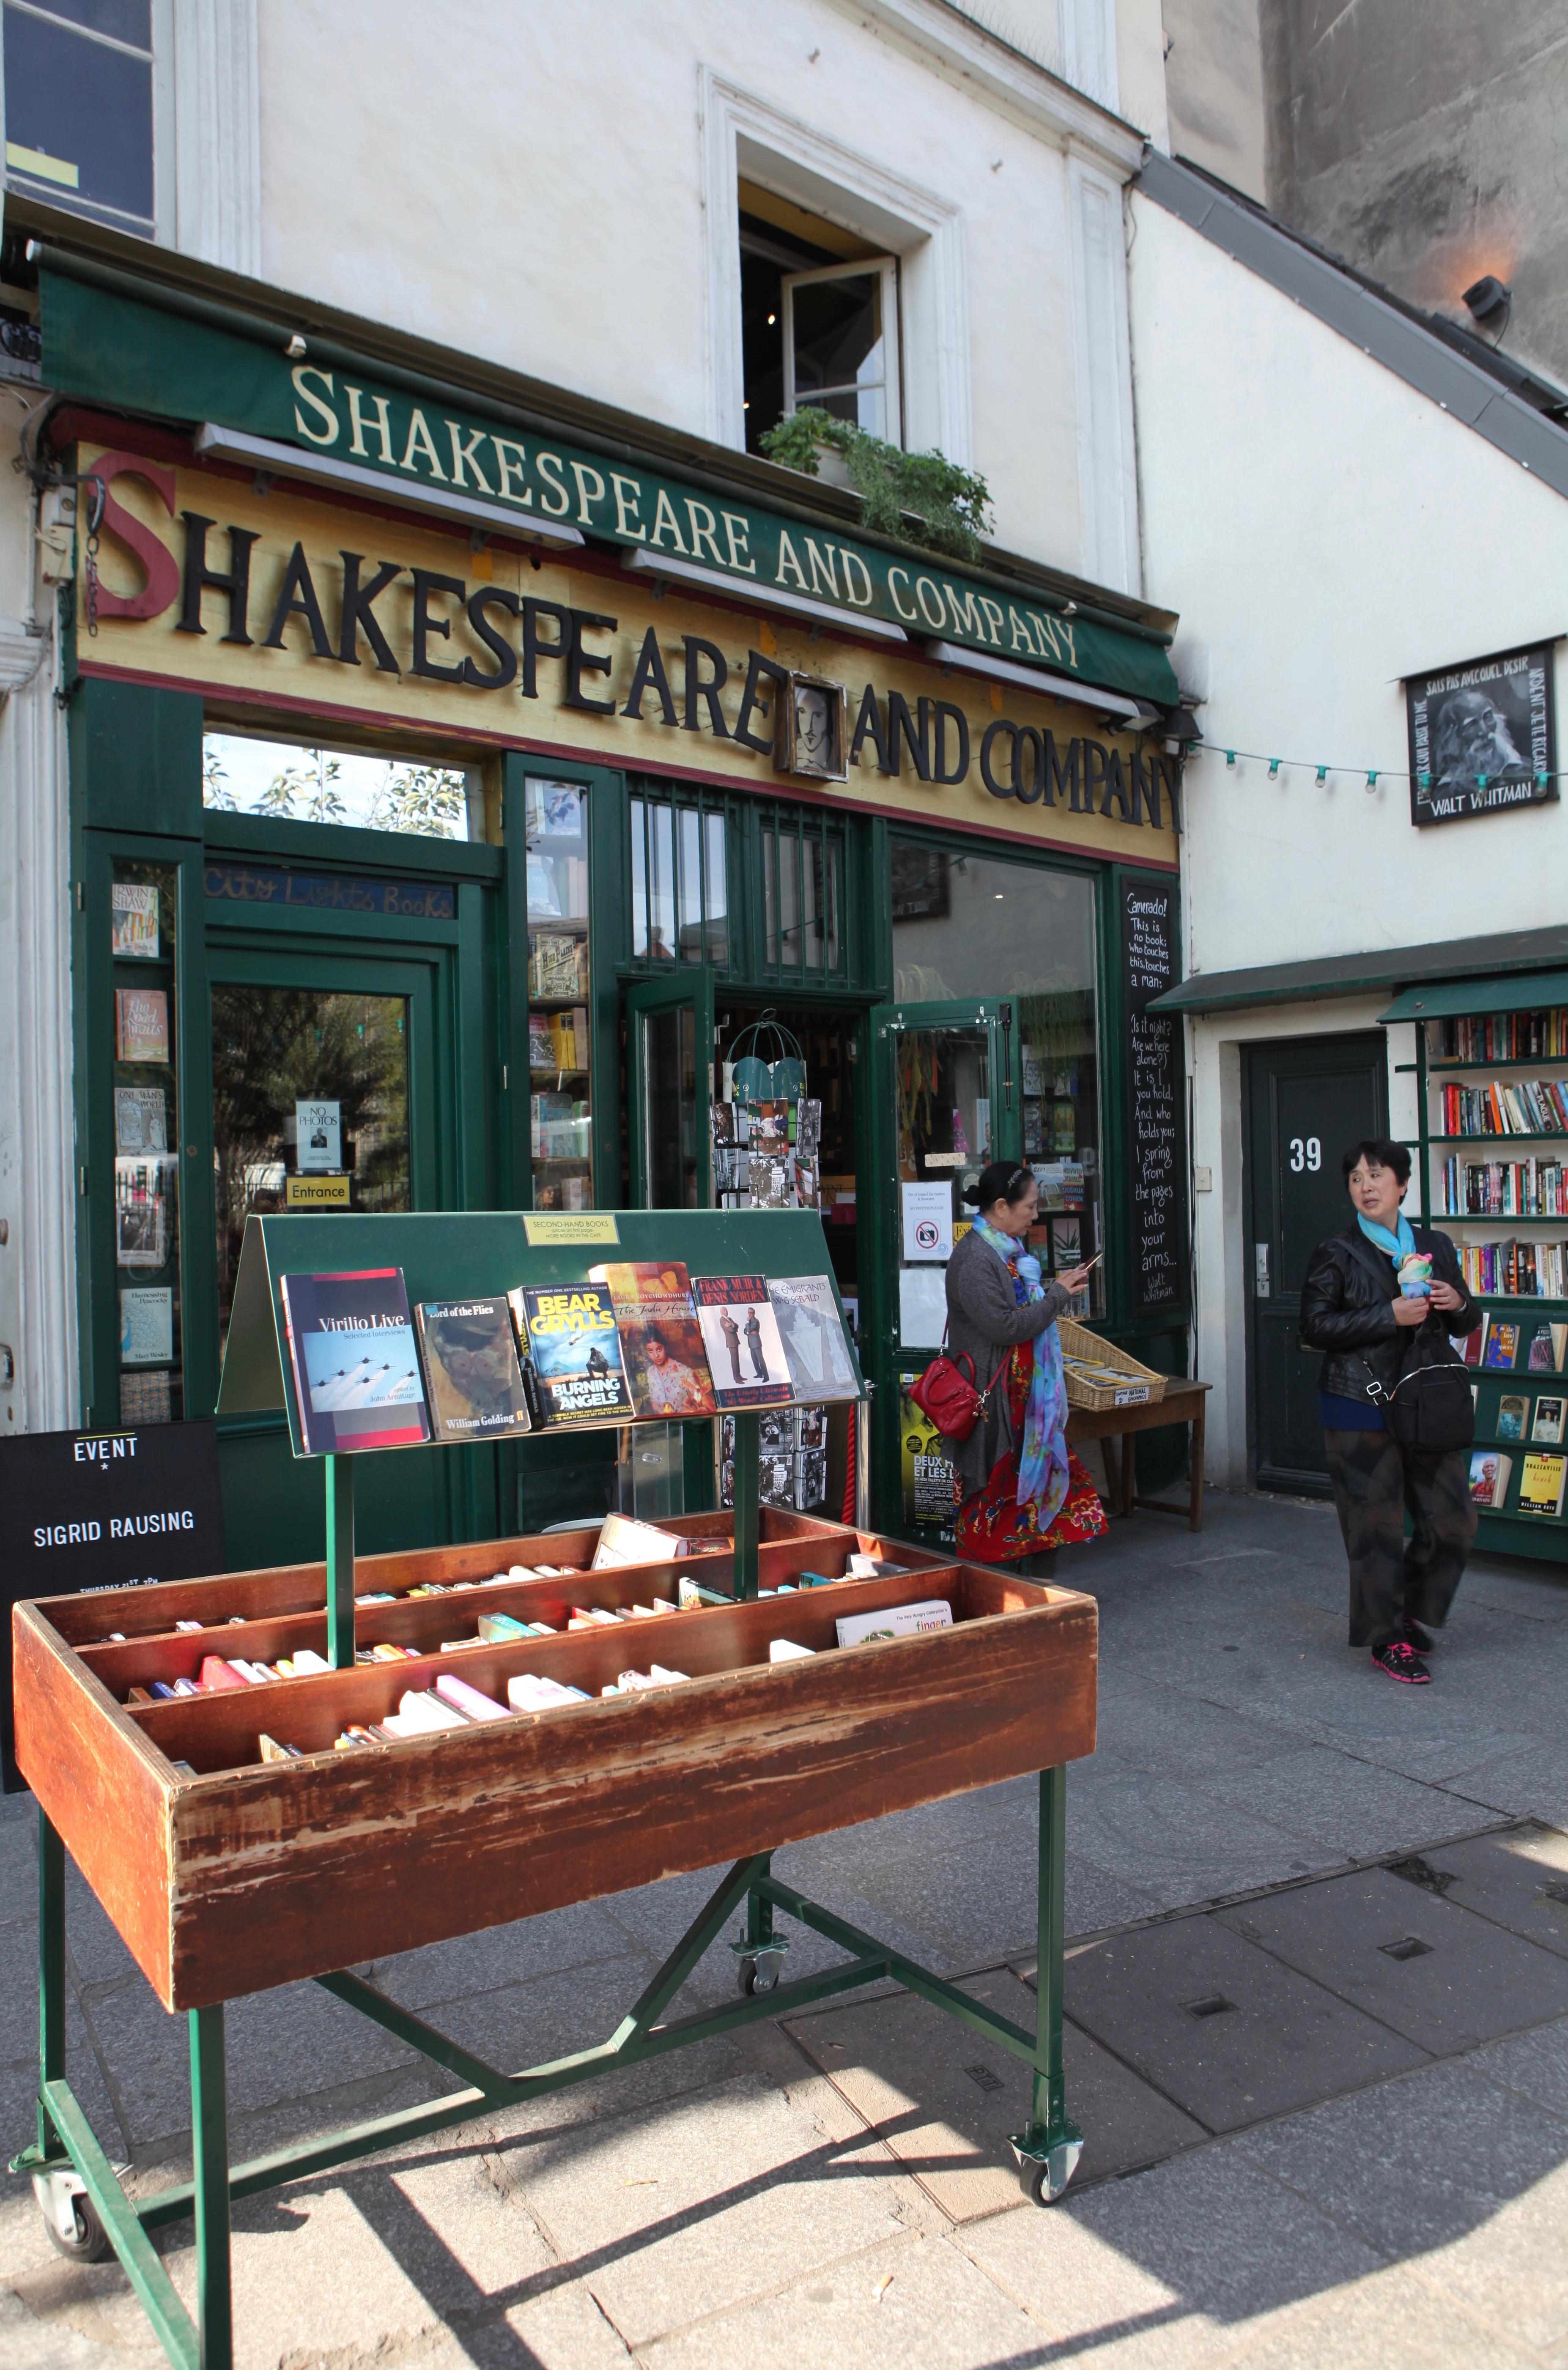 Voyage en littérature - Shakespeare & compagnie